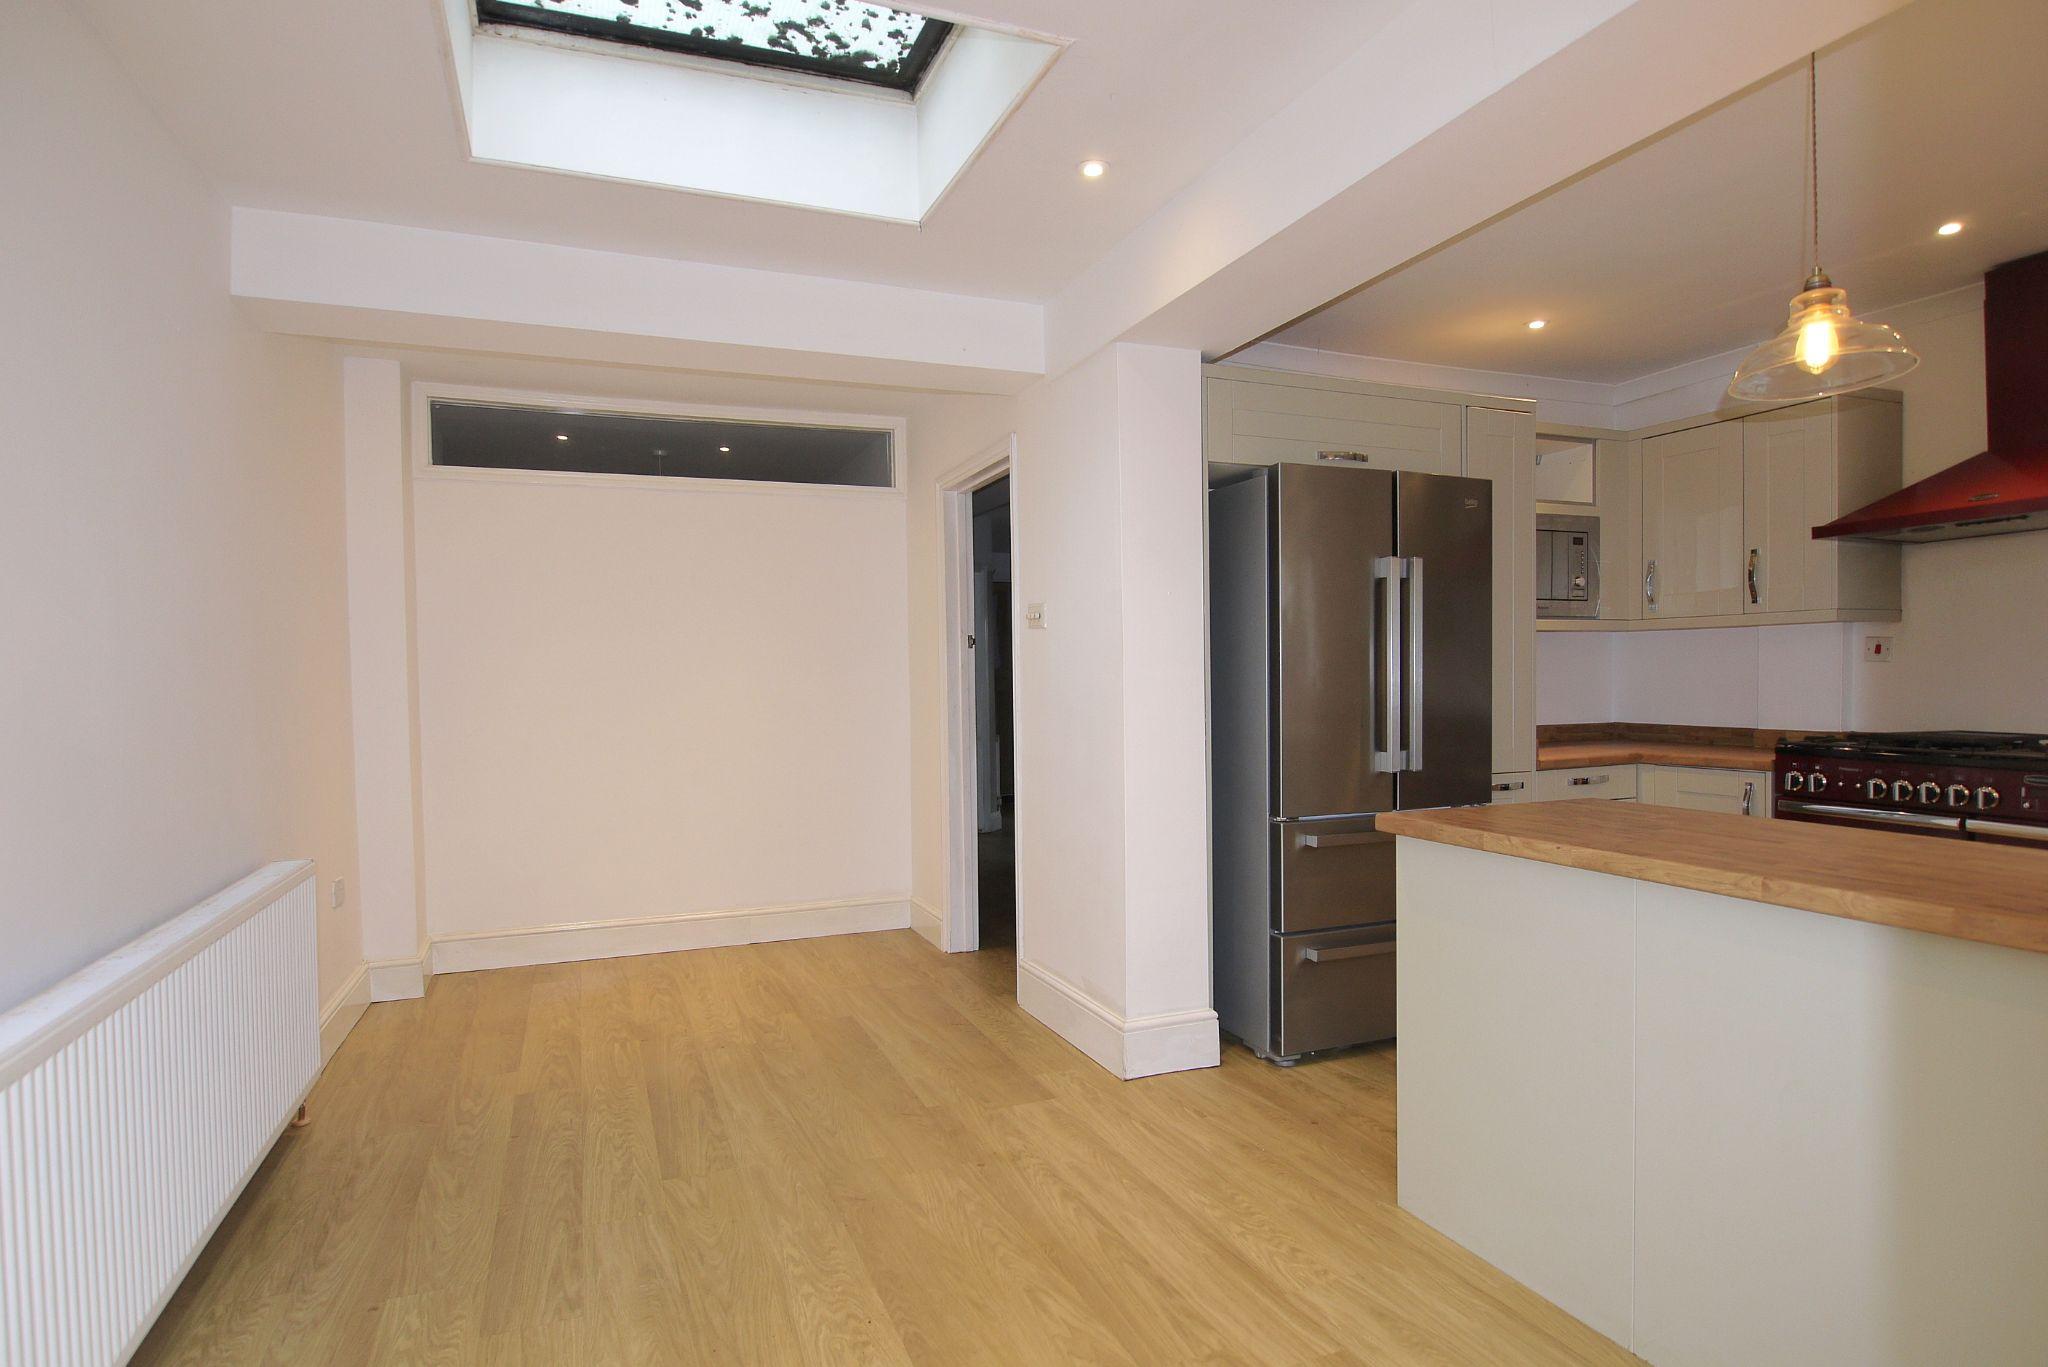 3 bedroom semi-detached house Sold in Sevenoaks - Photograph 4